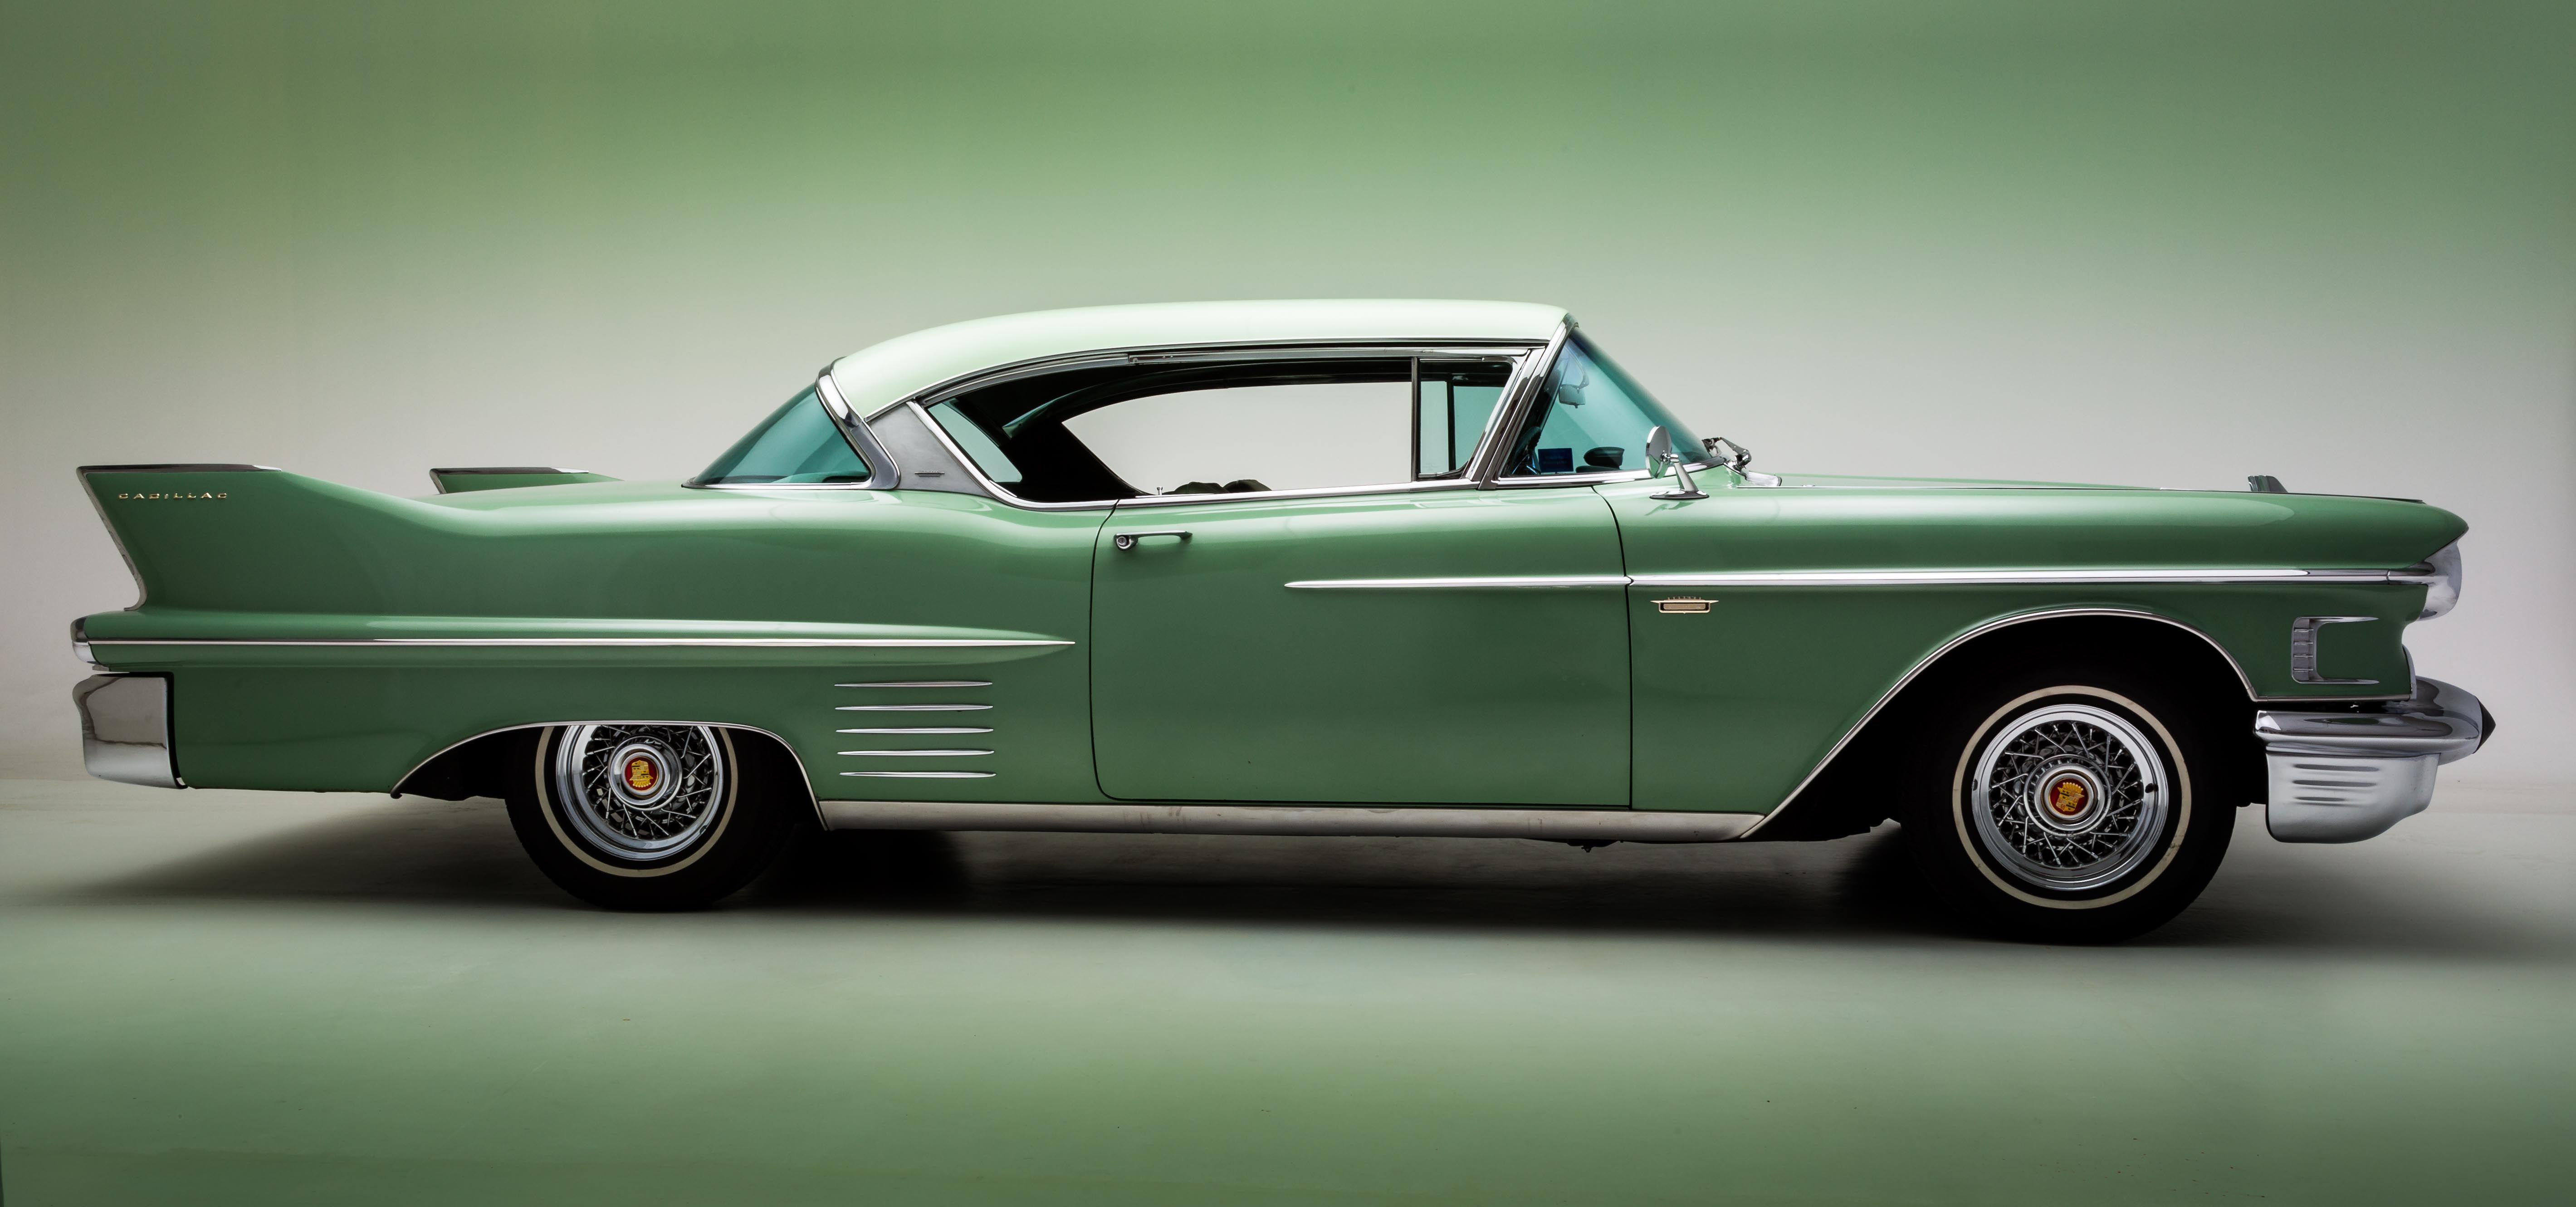 1958 Cadillac | American Classic Car, Classic Car Hire, Wedding Cars ...